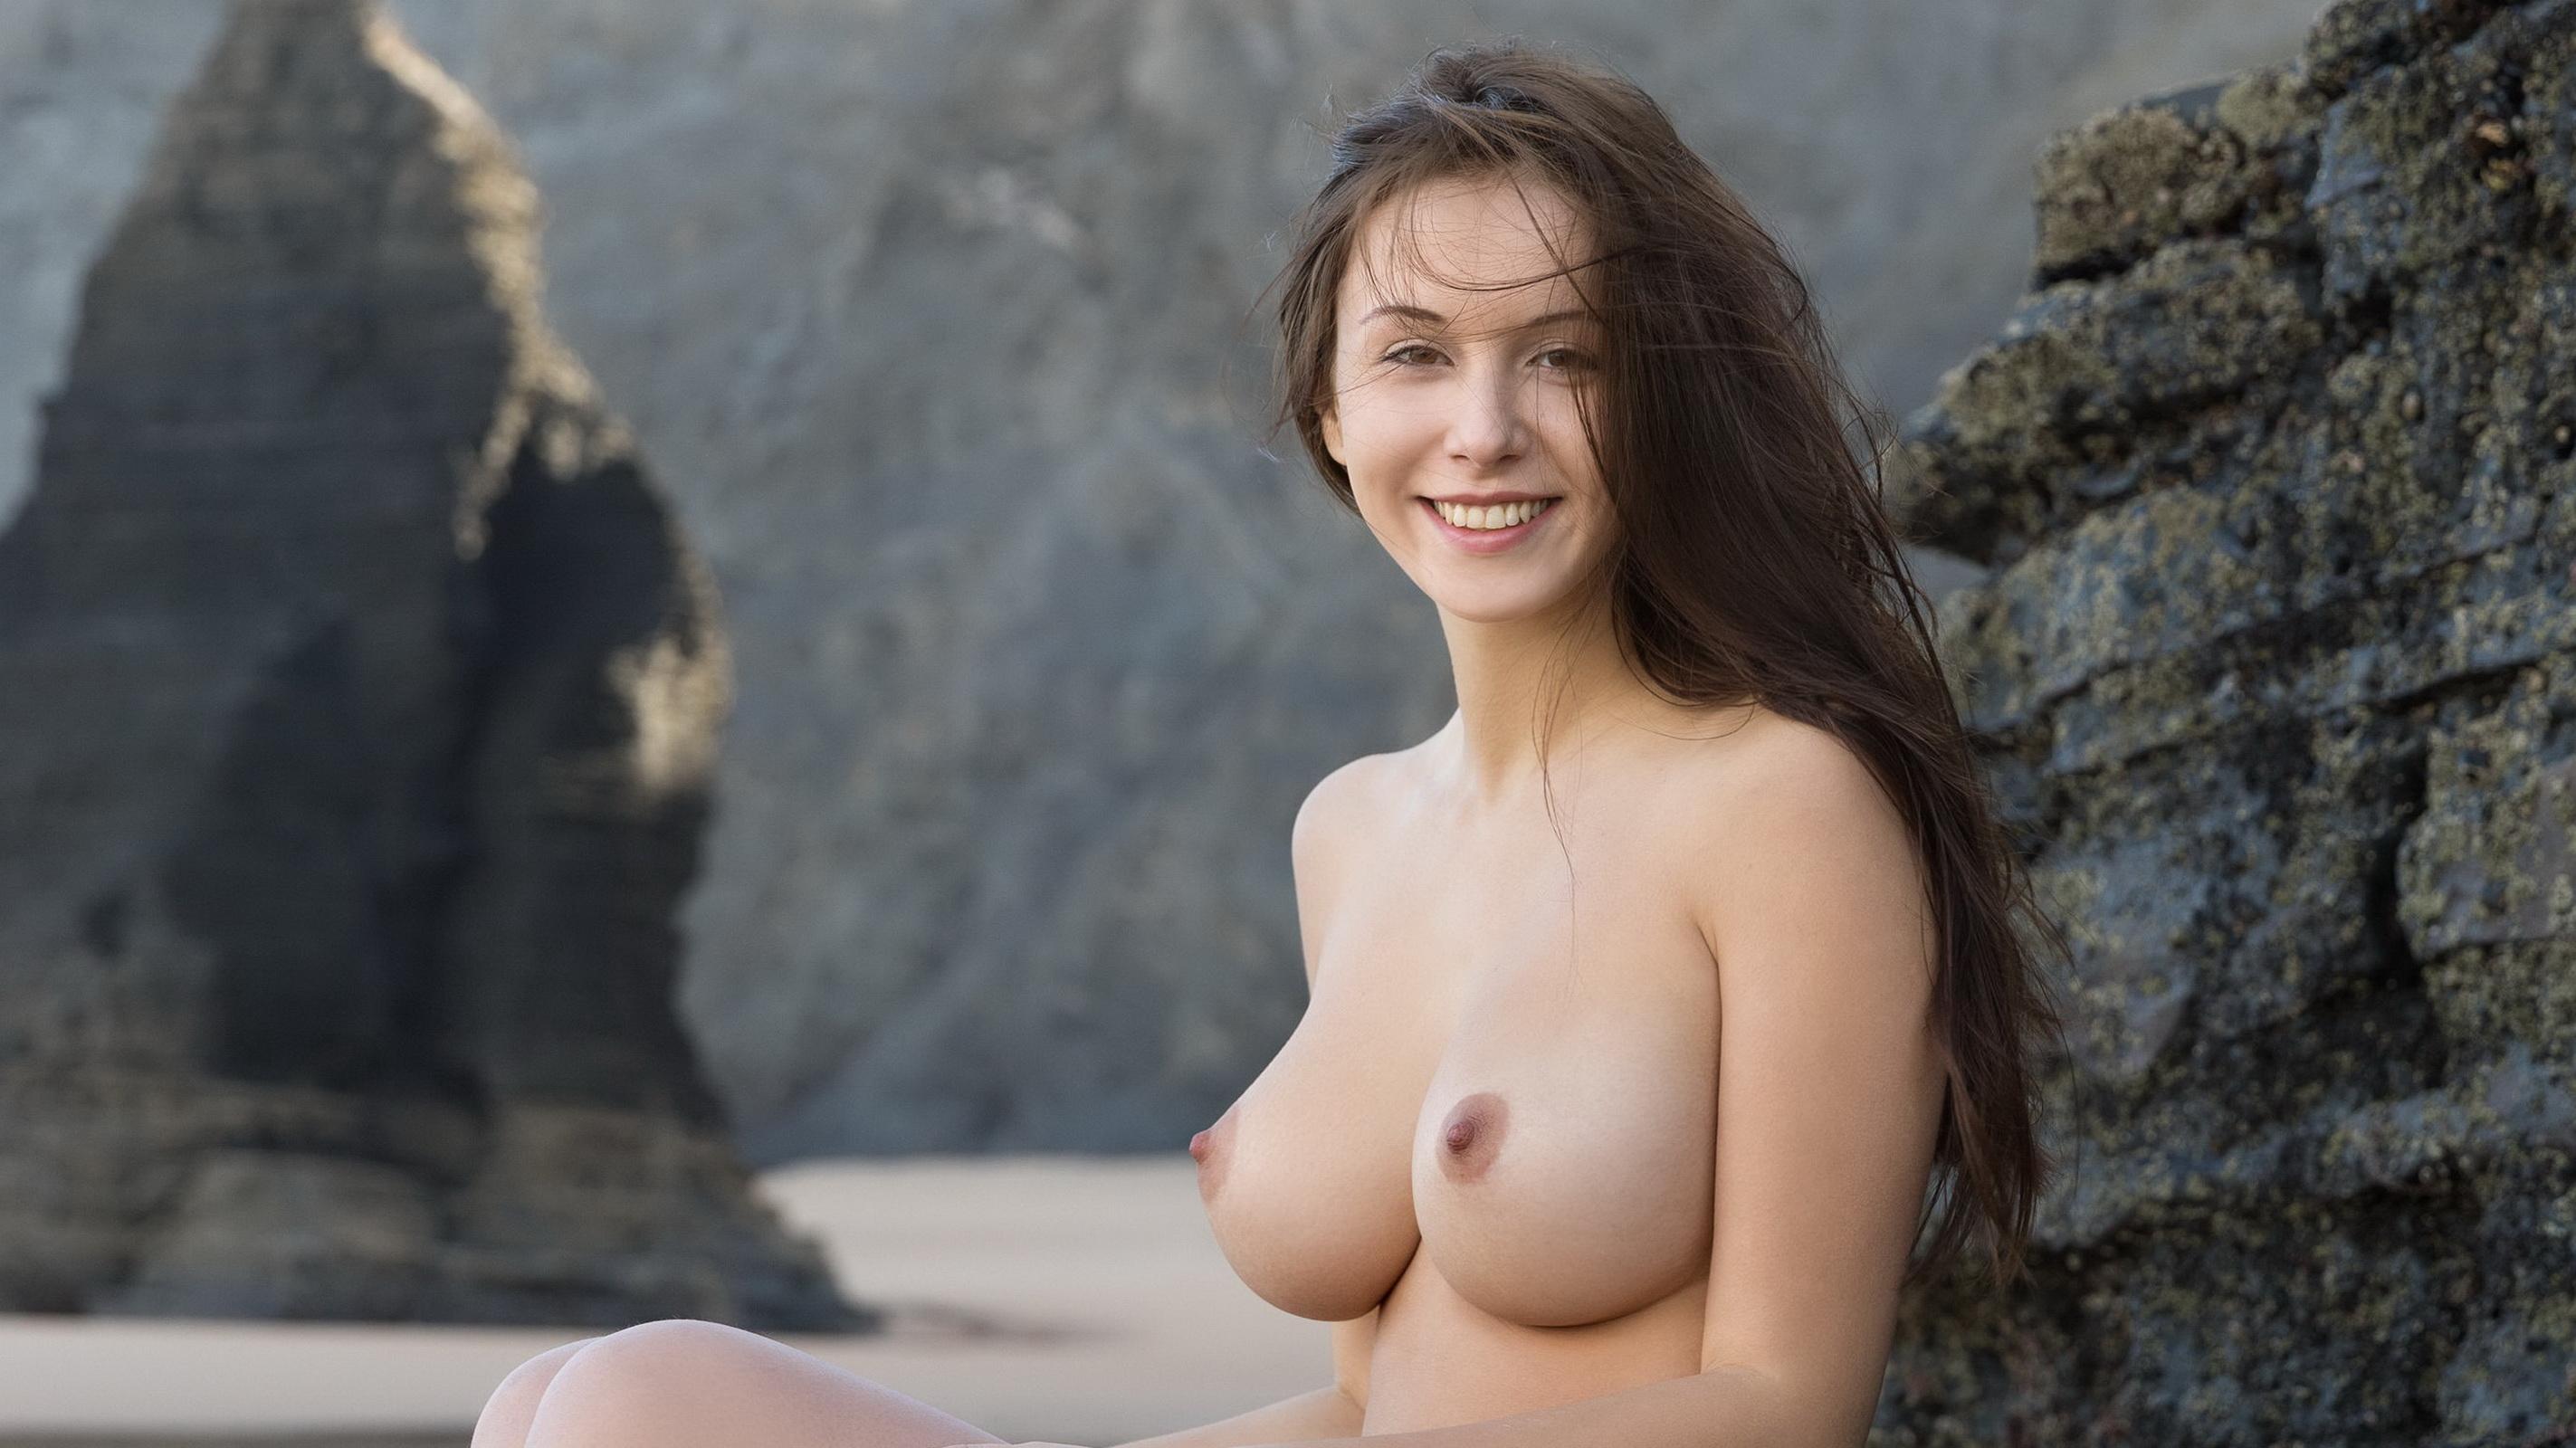 Jessica alba sexo oral xxx